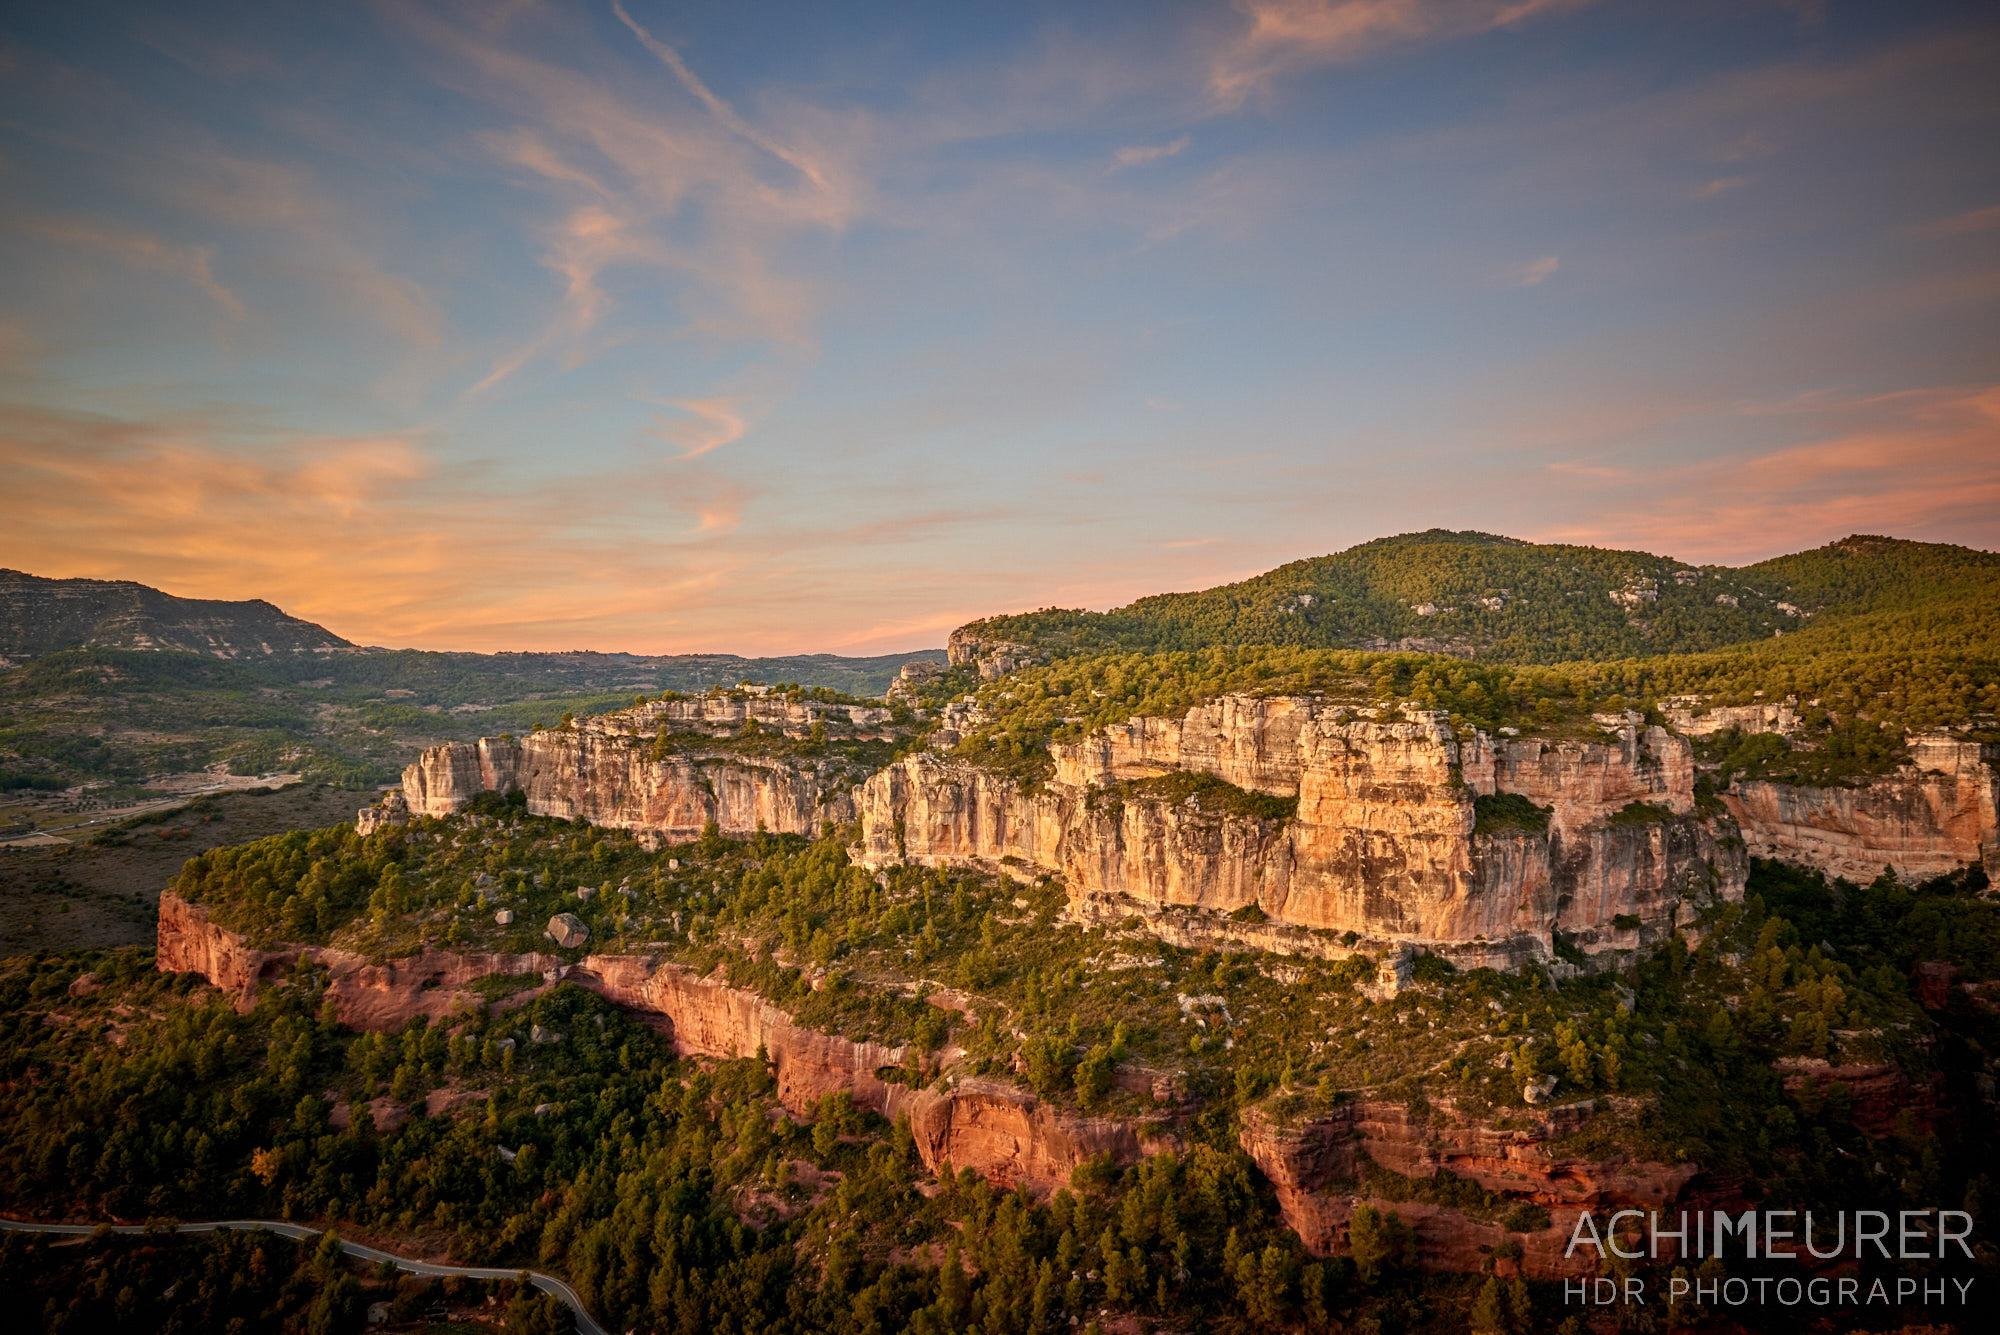 Sonnenuntergang in Siurana in den Bergen Katalonien, Spanien by AchimMeurer.com                     .